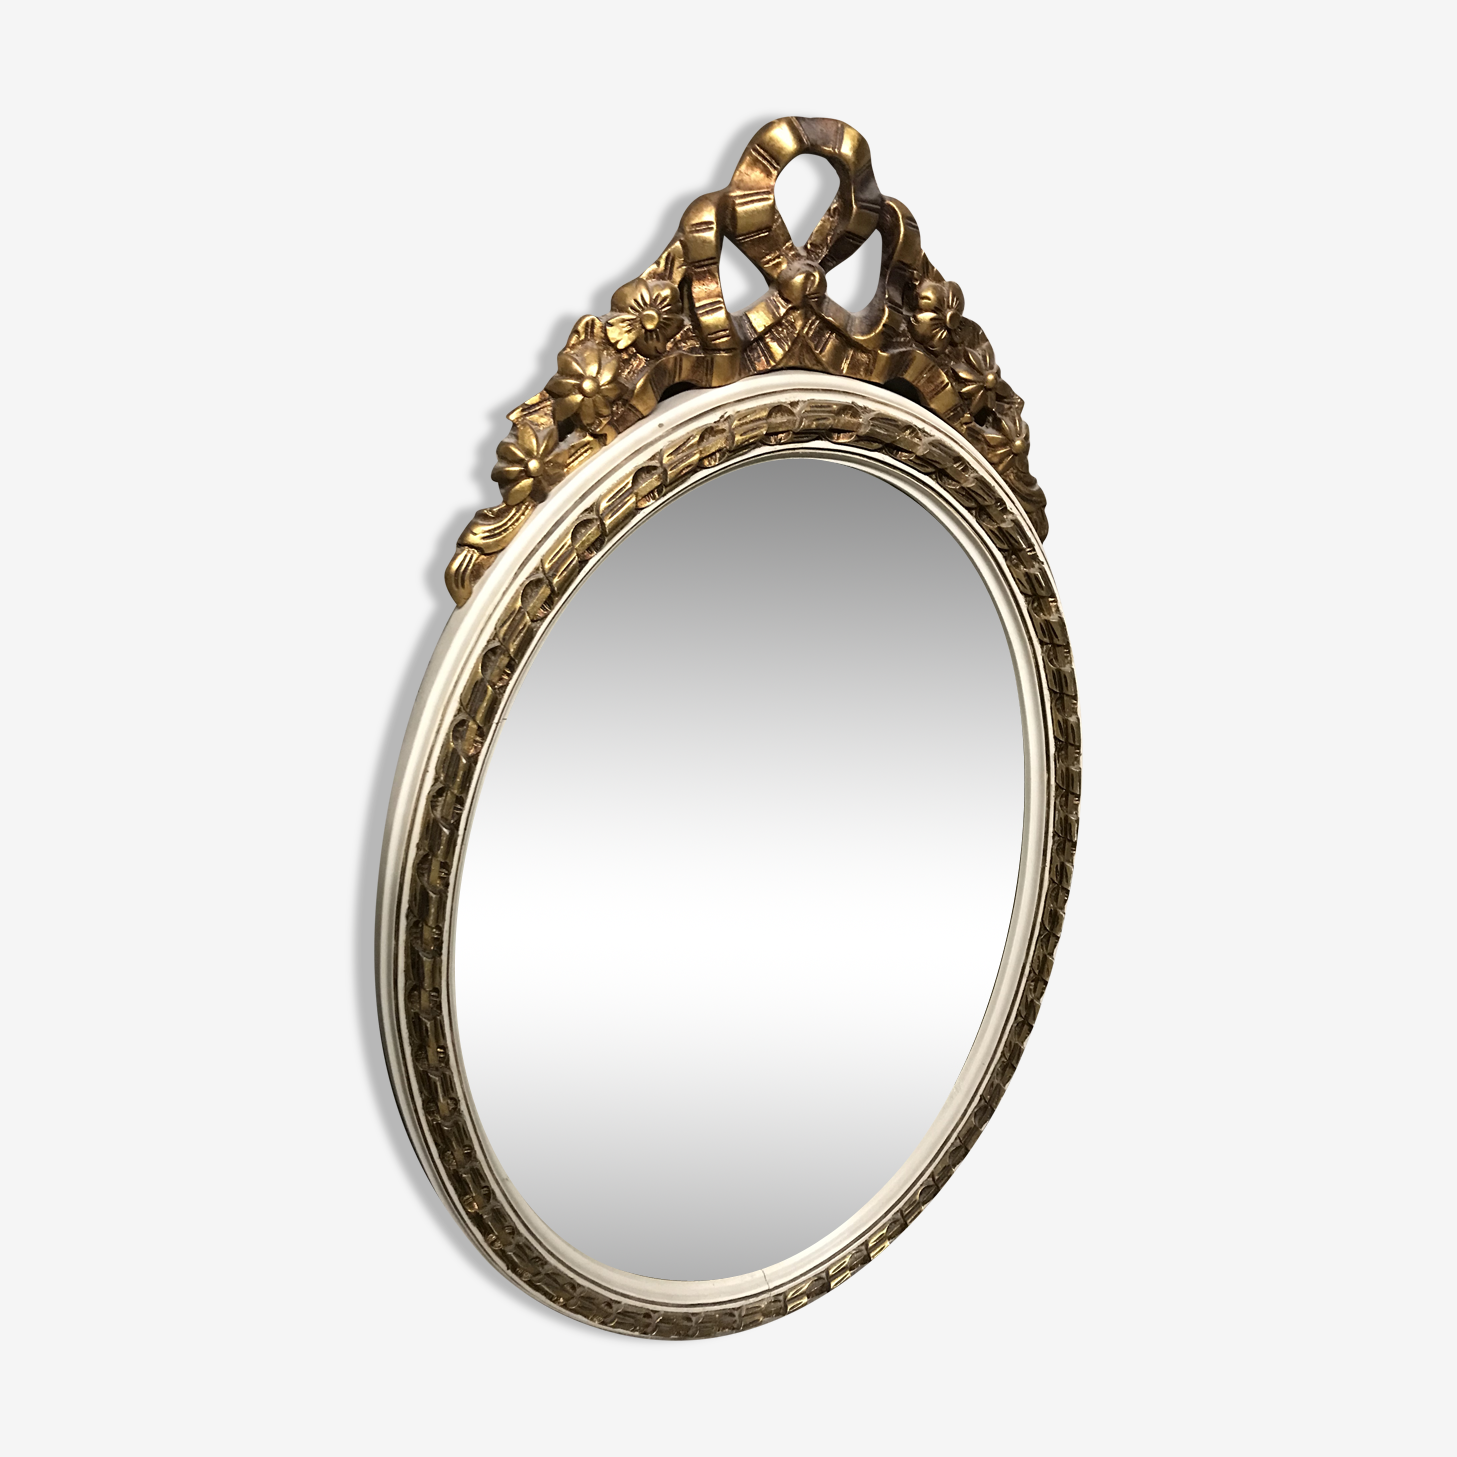 Oval mirror Louis XVI gilded style 53x90cm